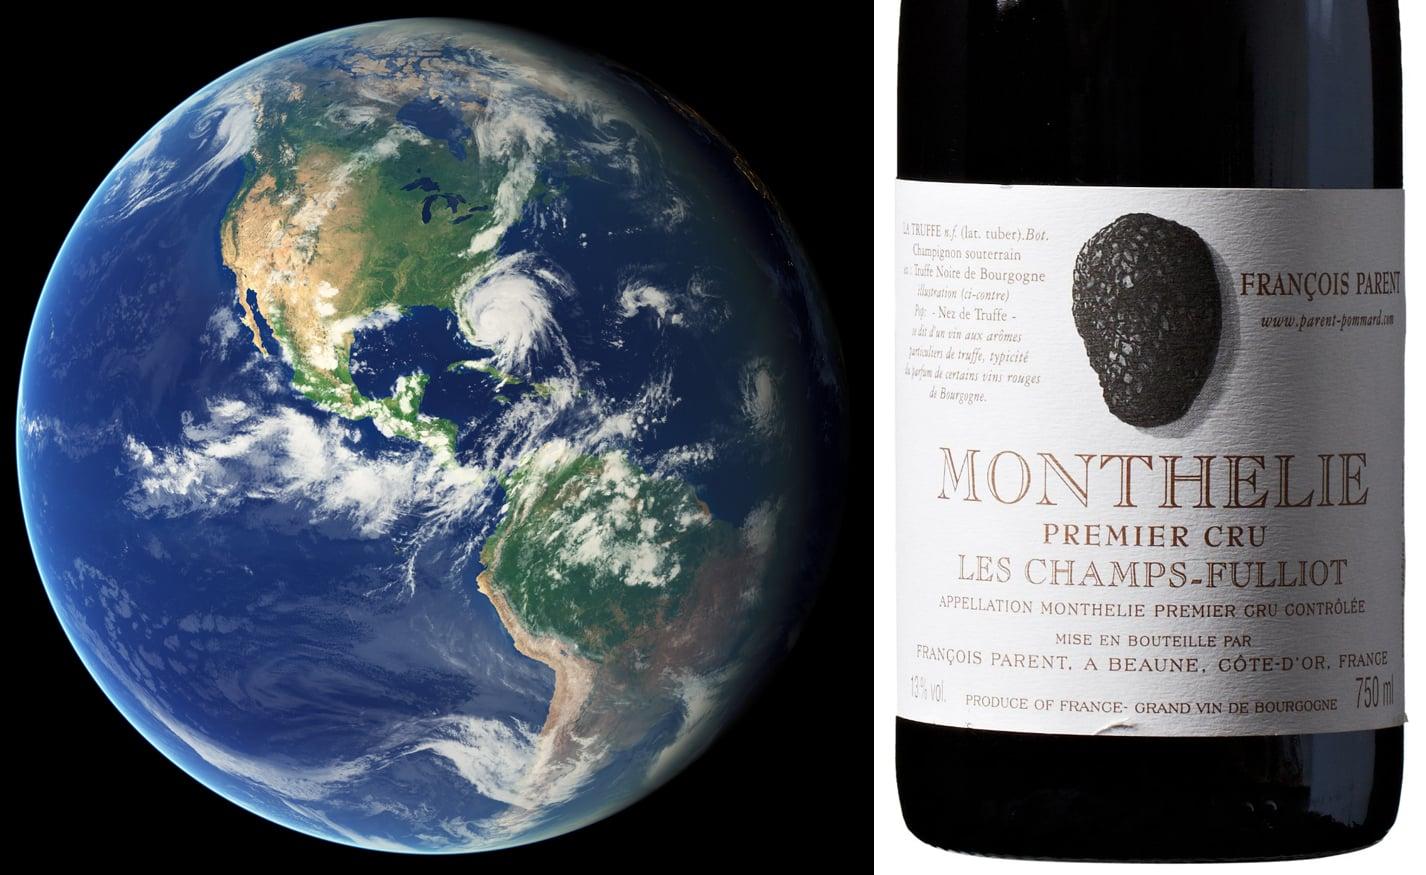 Earth and Burgundy Pinot Noir